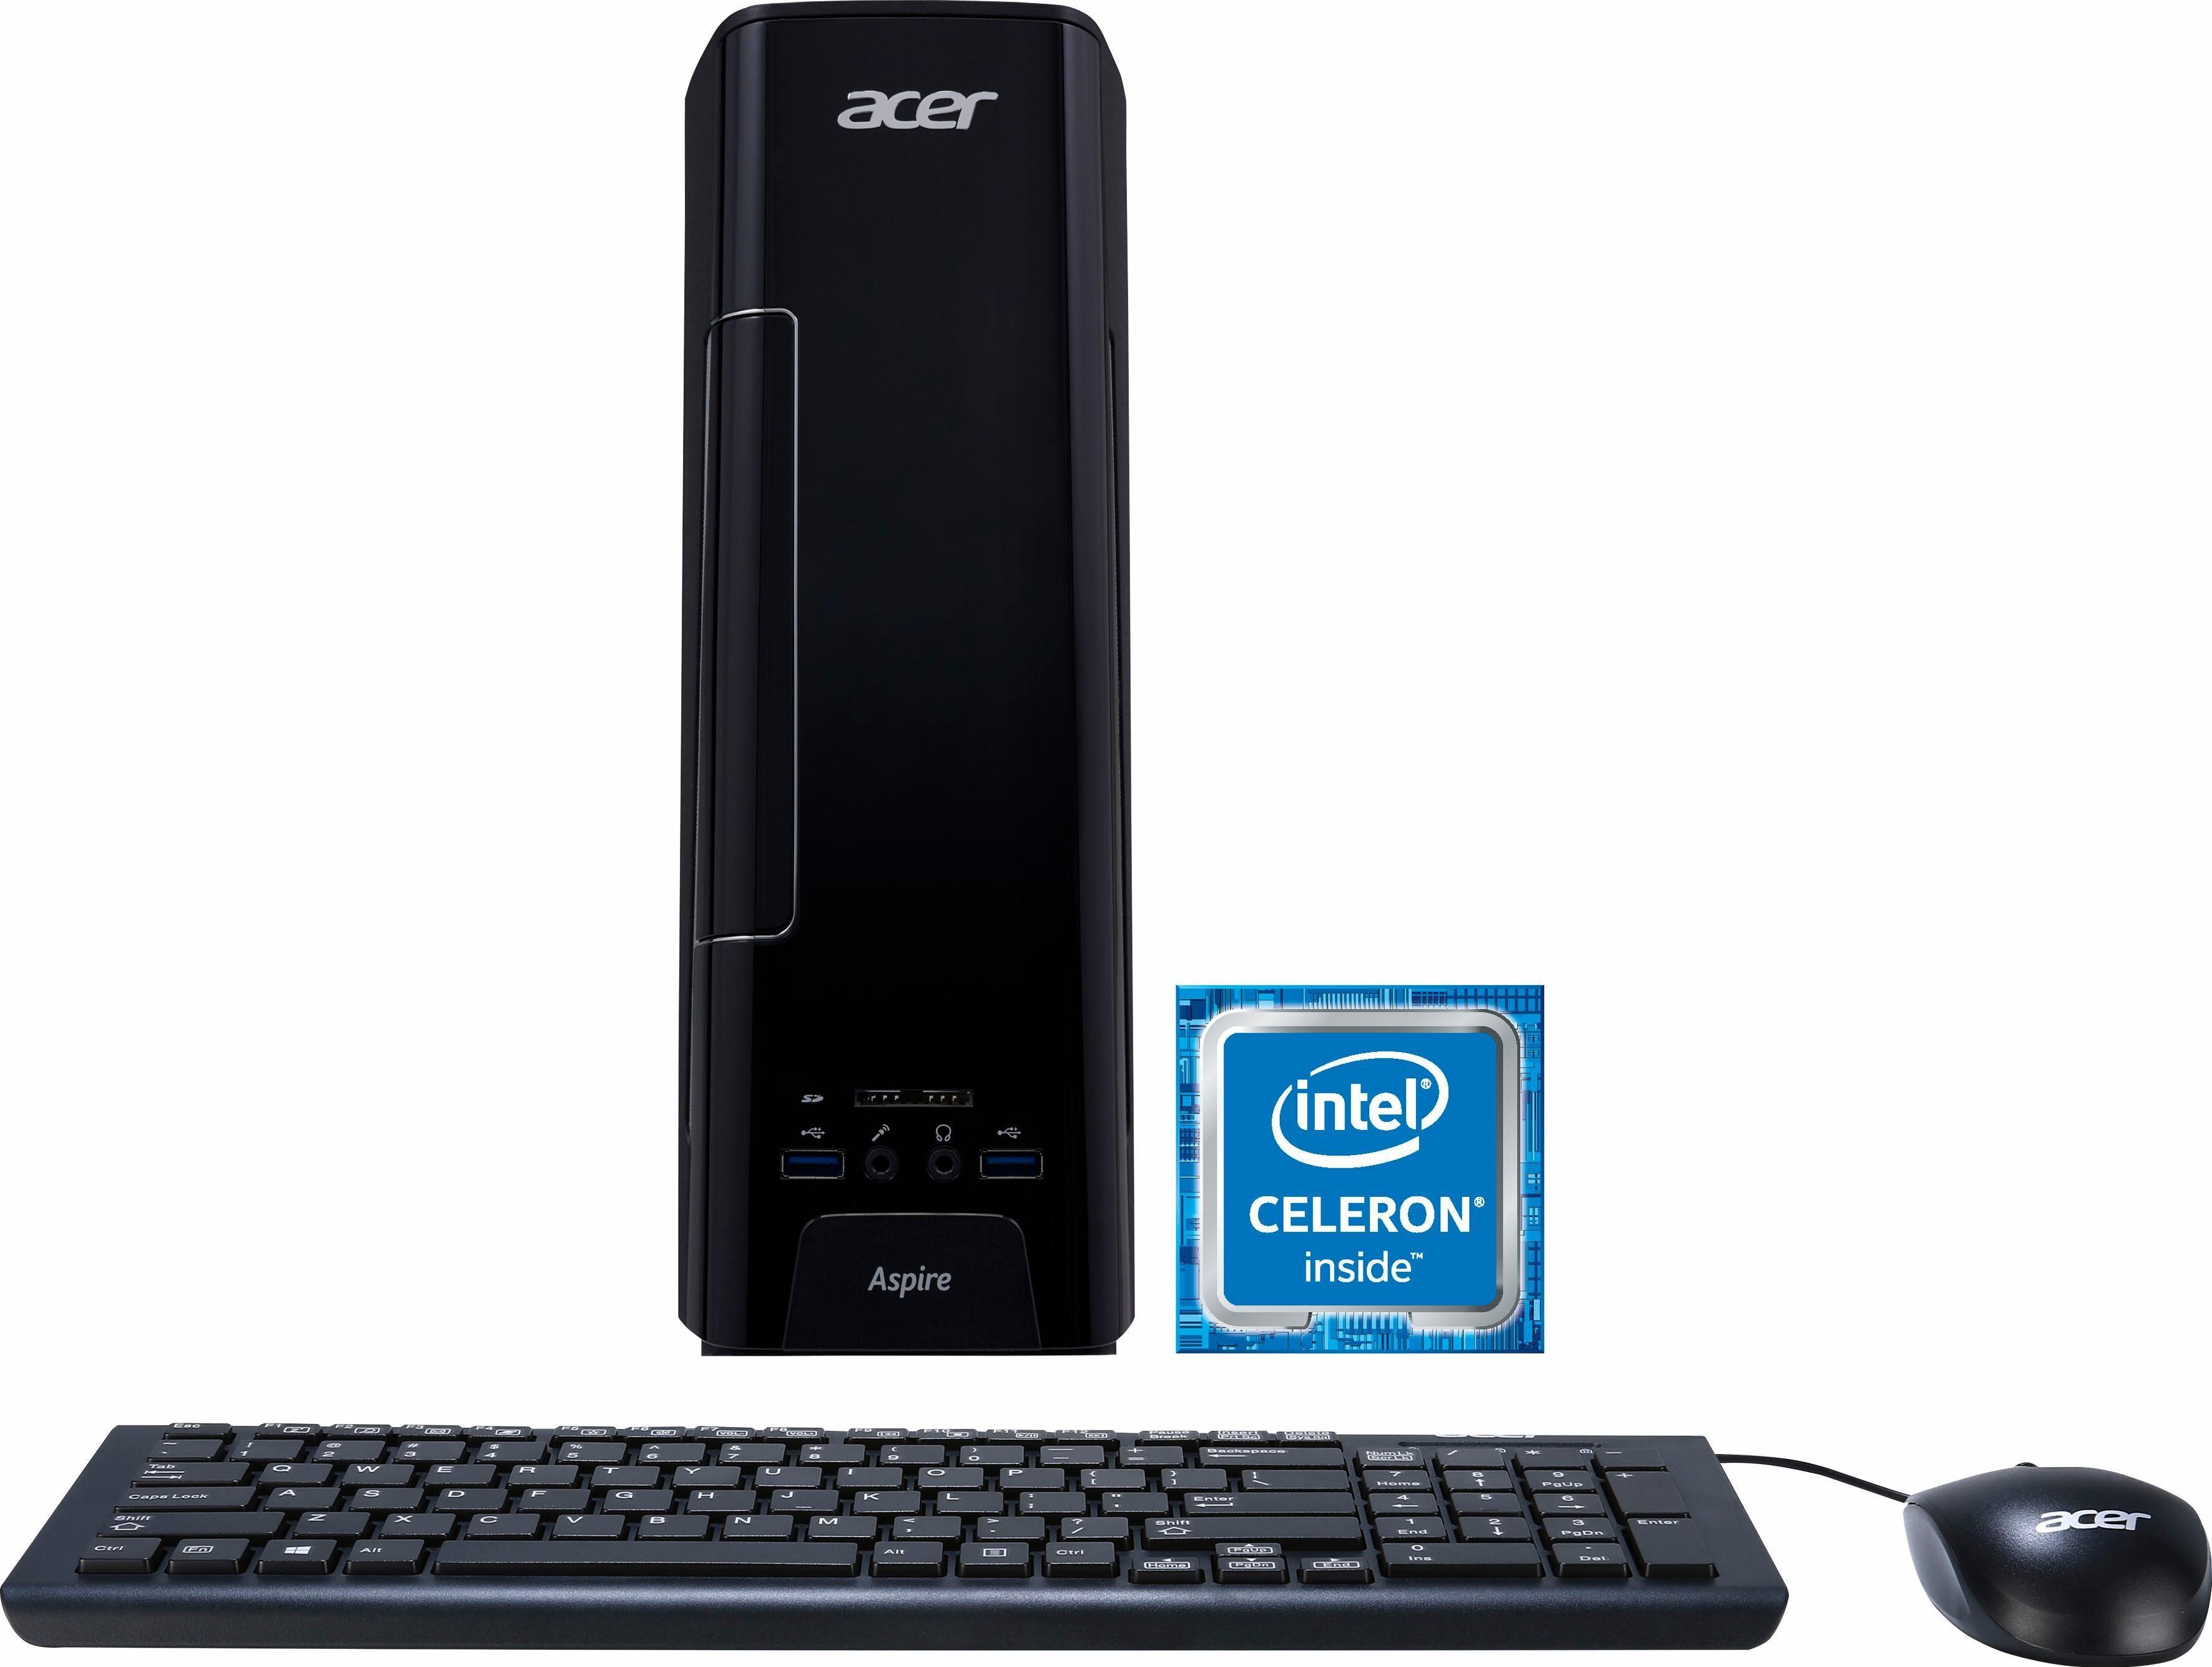 Acer Aspire XC 730, Celeron J3355 PC, Intel® Celeron™, 4096 MB DDR3-RAM, 1000 GB Speicher